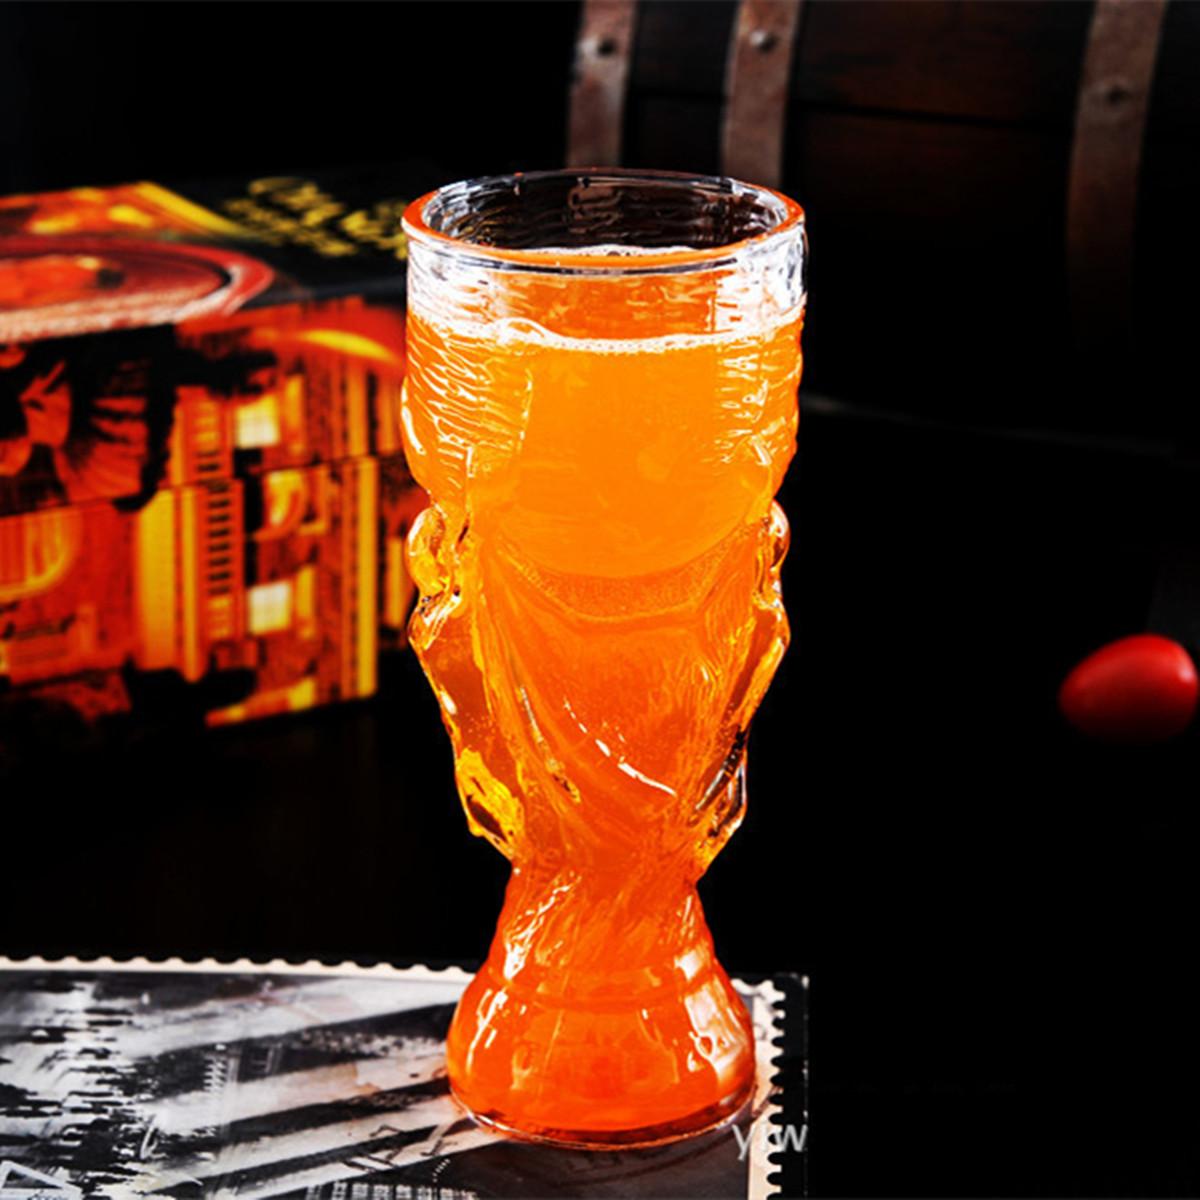 350ml Glass Beer Cup Glasses Crystal Water Whiskey Wine Drinking Mug Football Barware